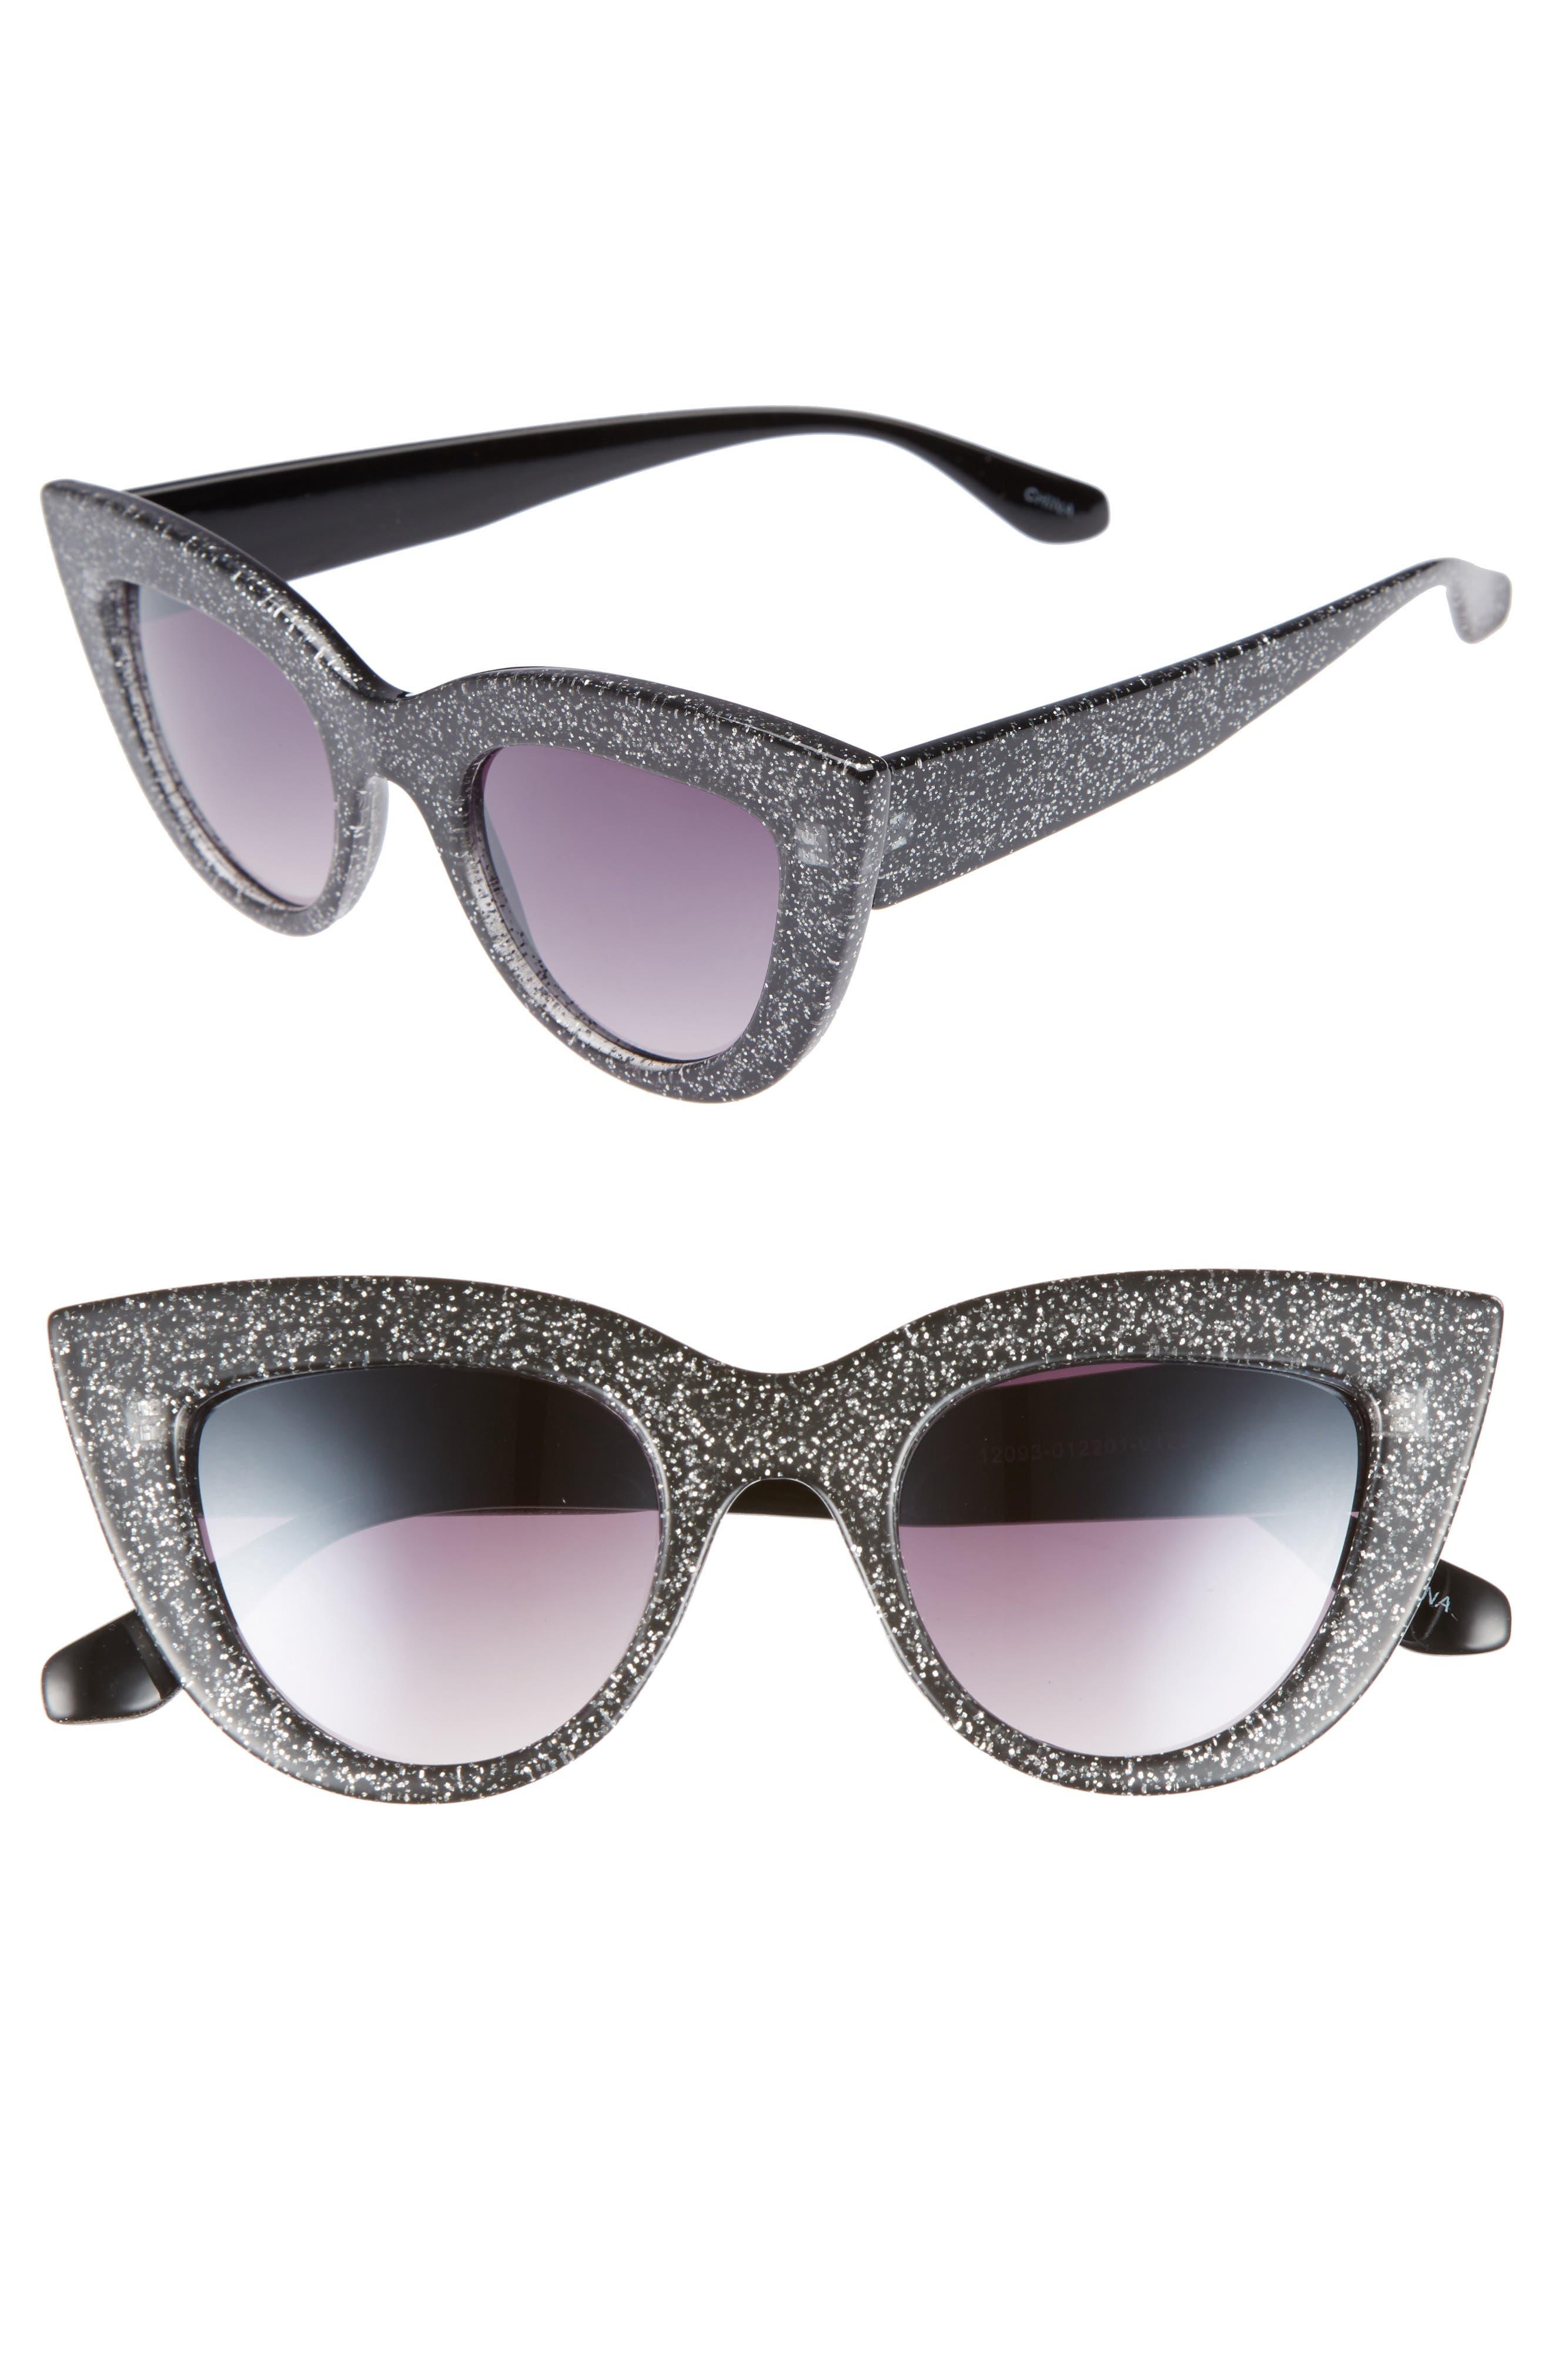 45mm Glitter Cat Eye Sunglasses,                             Main thumbnail 1, color,                             Black/ Silver